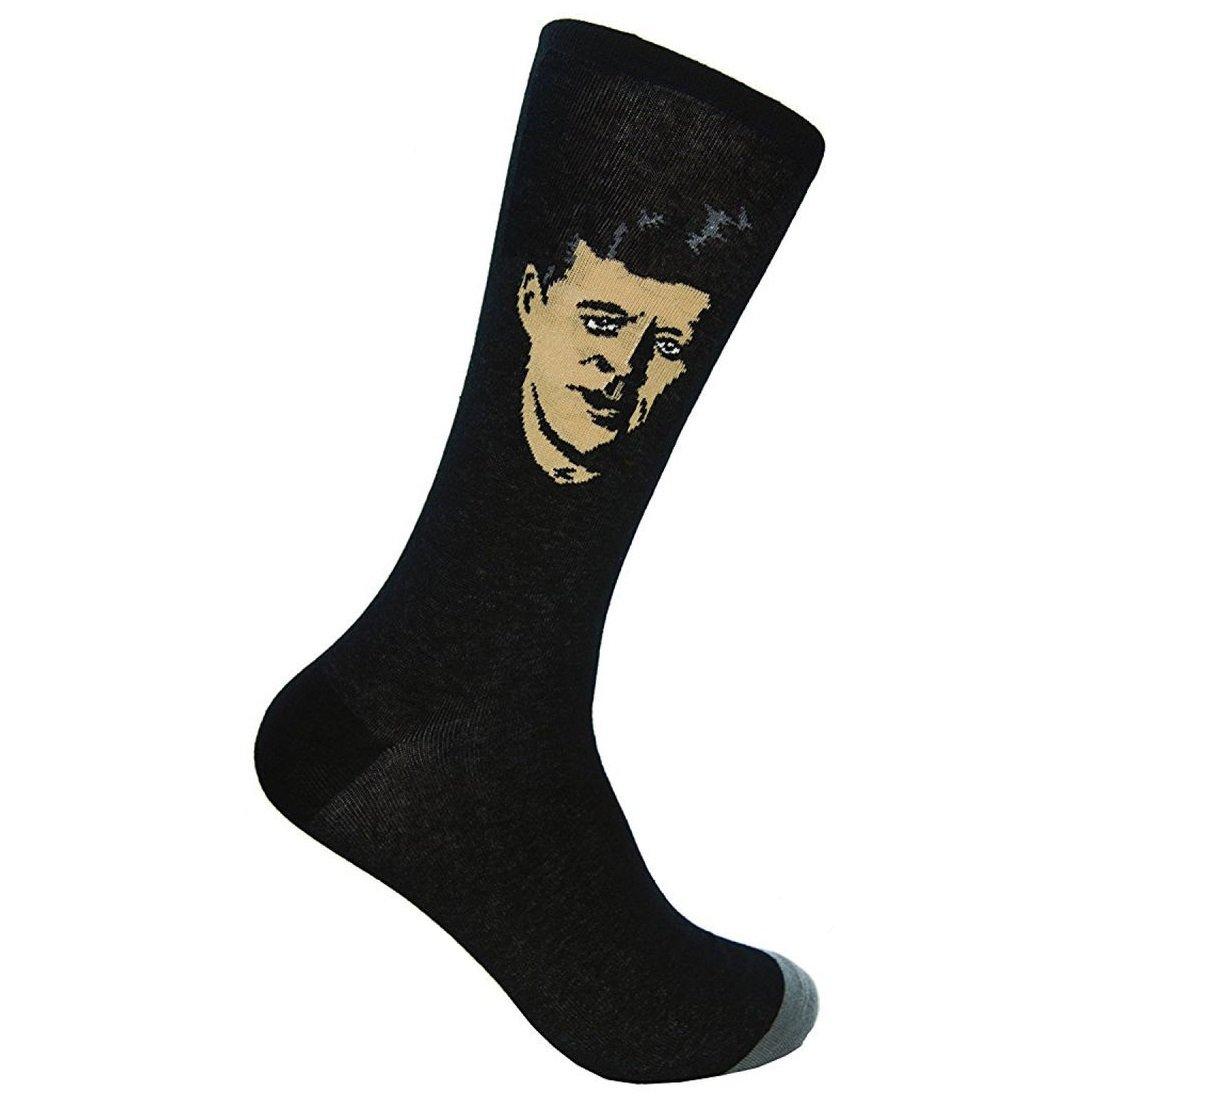 Jfk John Fitzgerald Kennedy Socks Dress Novelty Us